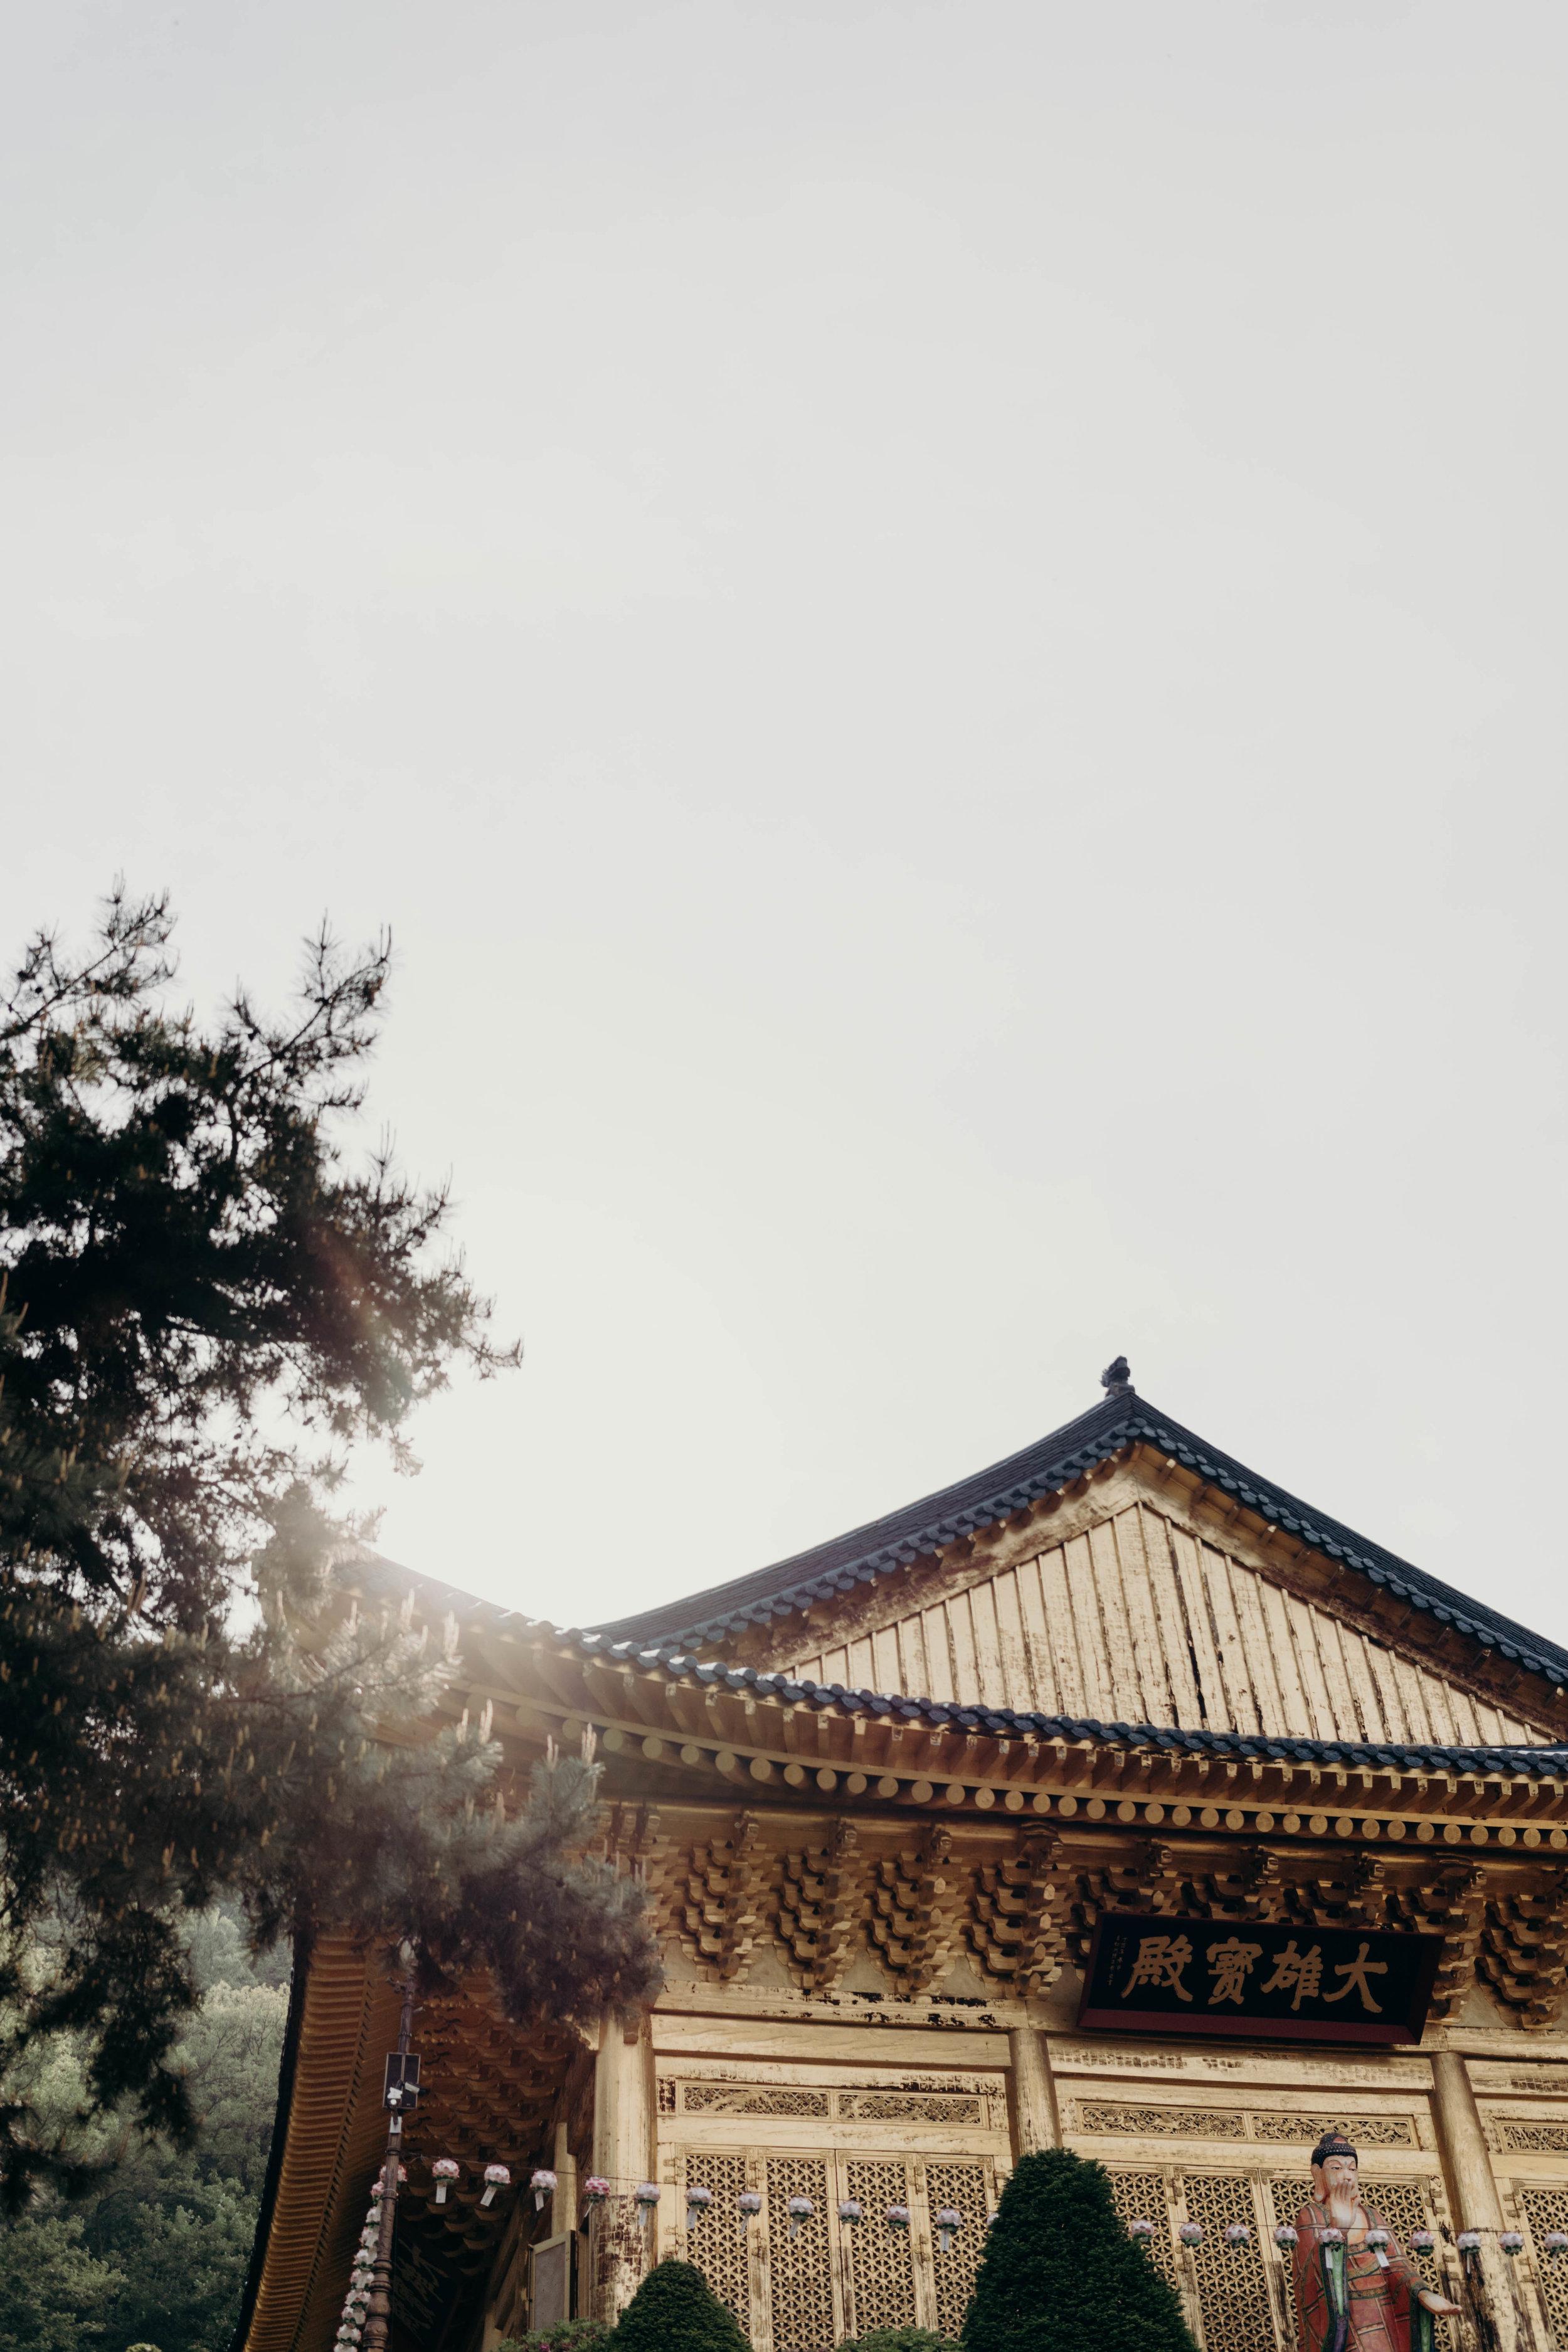 Suguksa: Seoul's Golden Temple | On the Street Where We Live ( aretherelilactrees.com )  Suguksa temple, golden temple, Seoul, South Korea